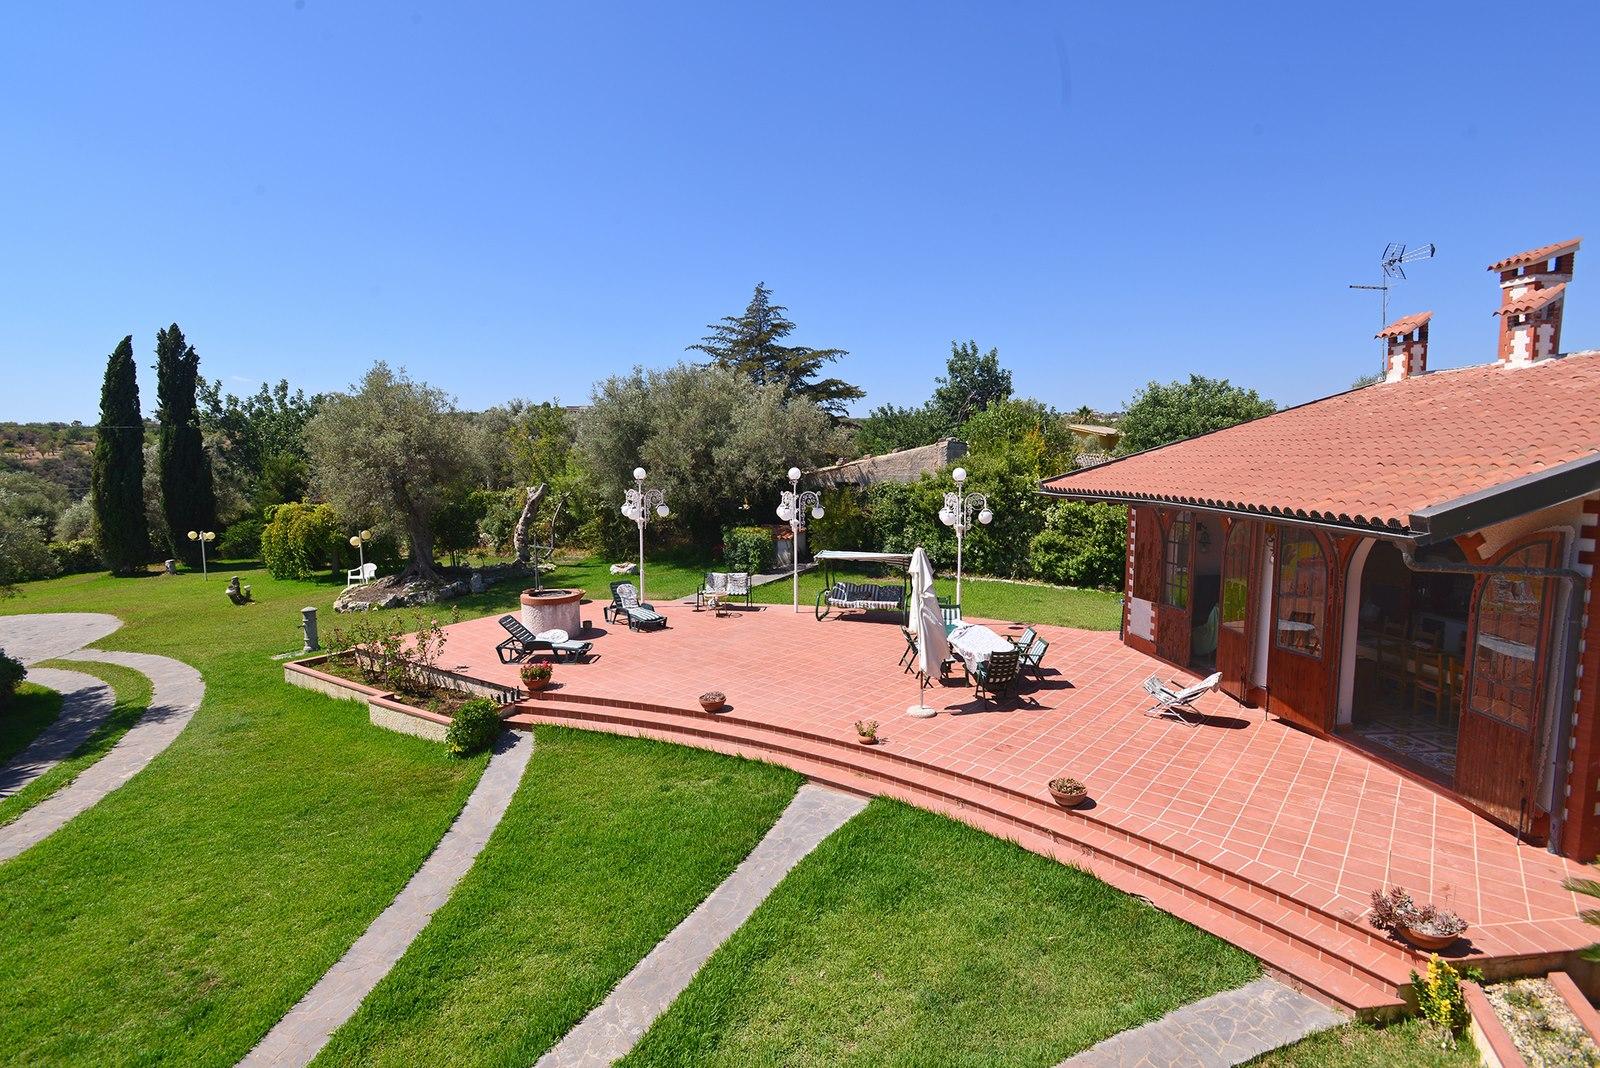 Maison de vacances Villa Casa (1531407), Solarino, Siracusa, Sicile, Italie, image 18